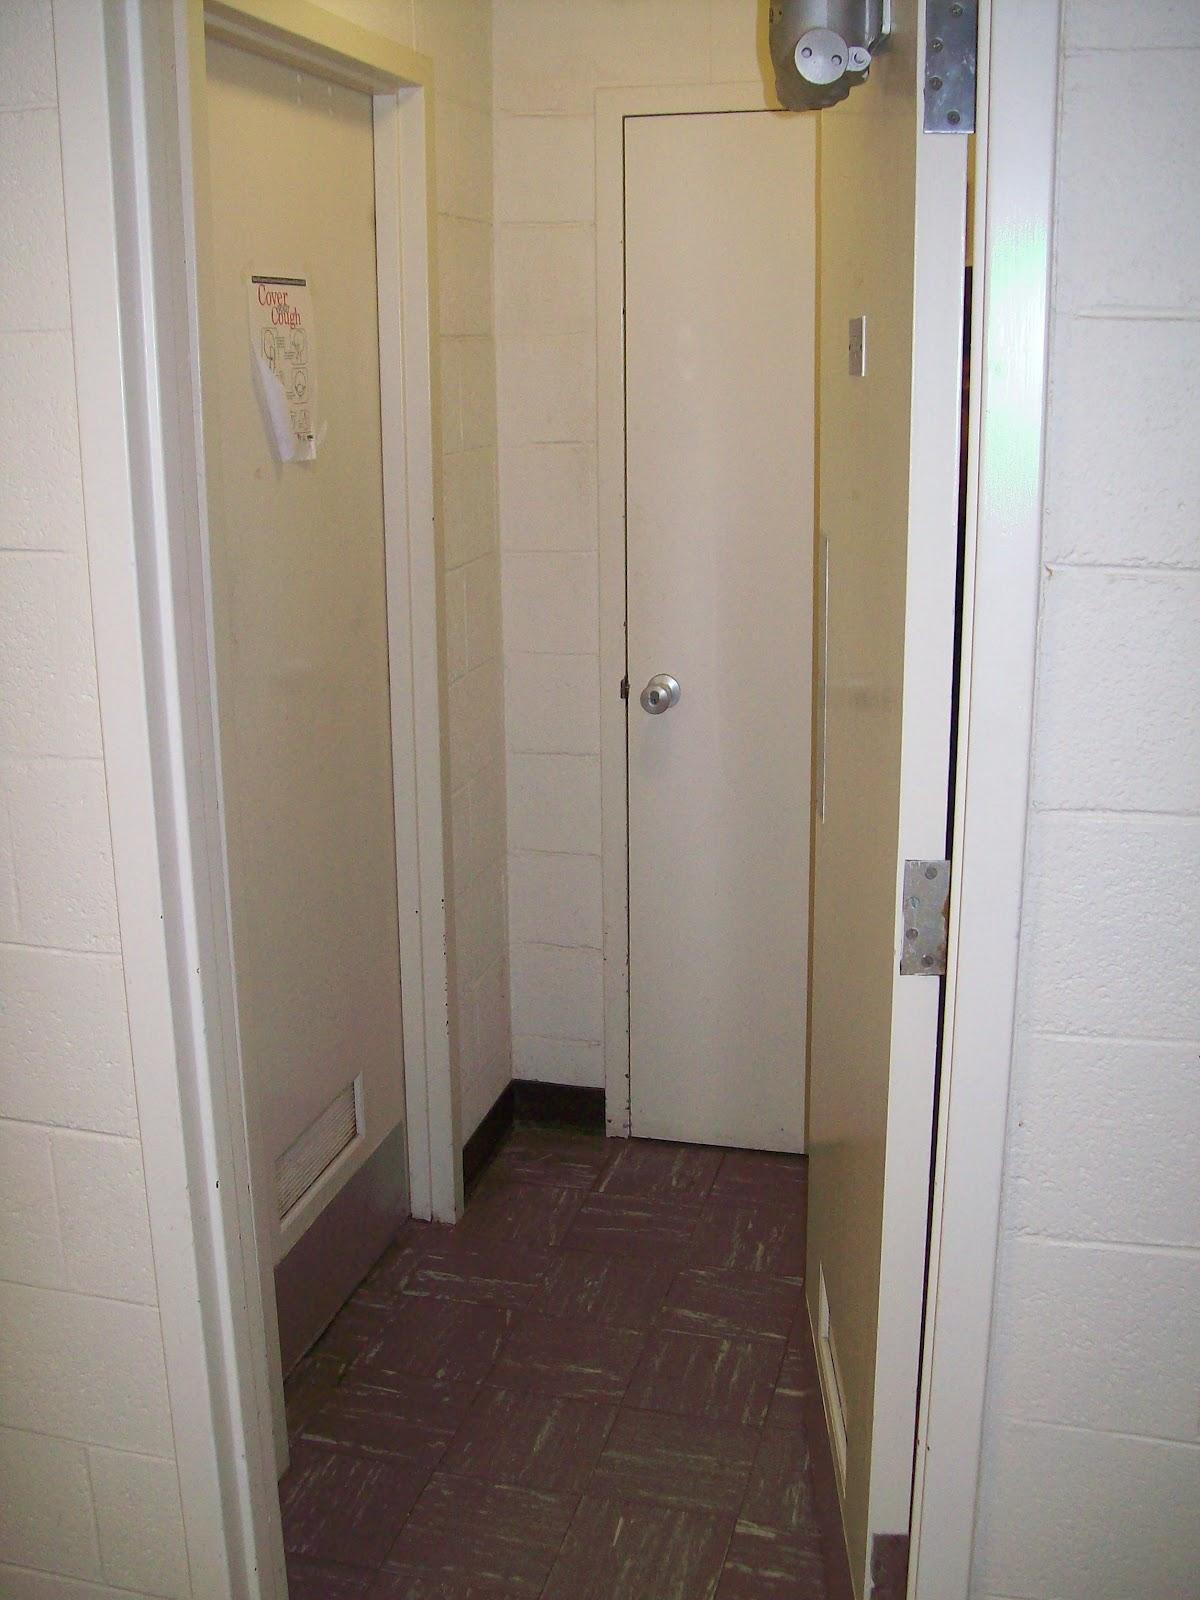 Hsc Underground 10 Most Unique Men S Rooms At Hsc